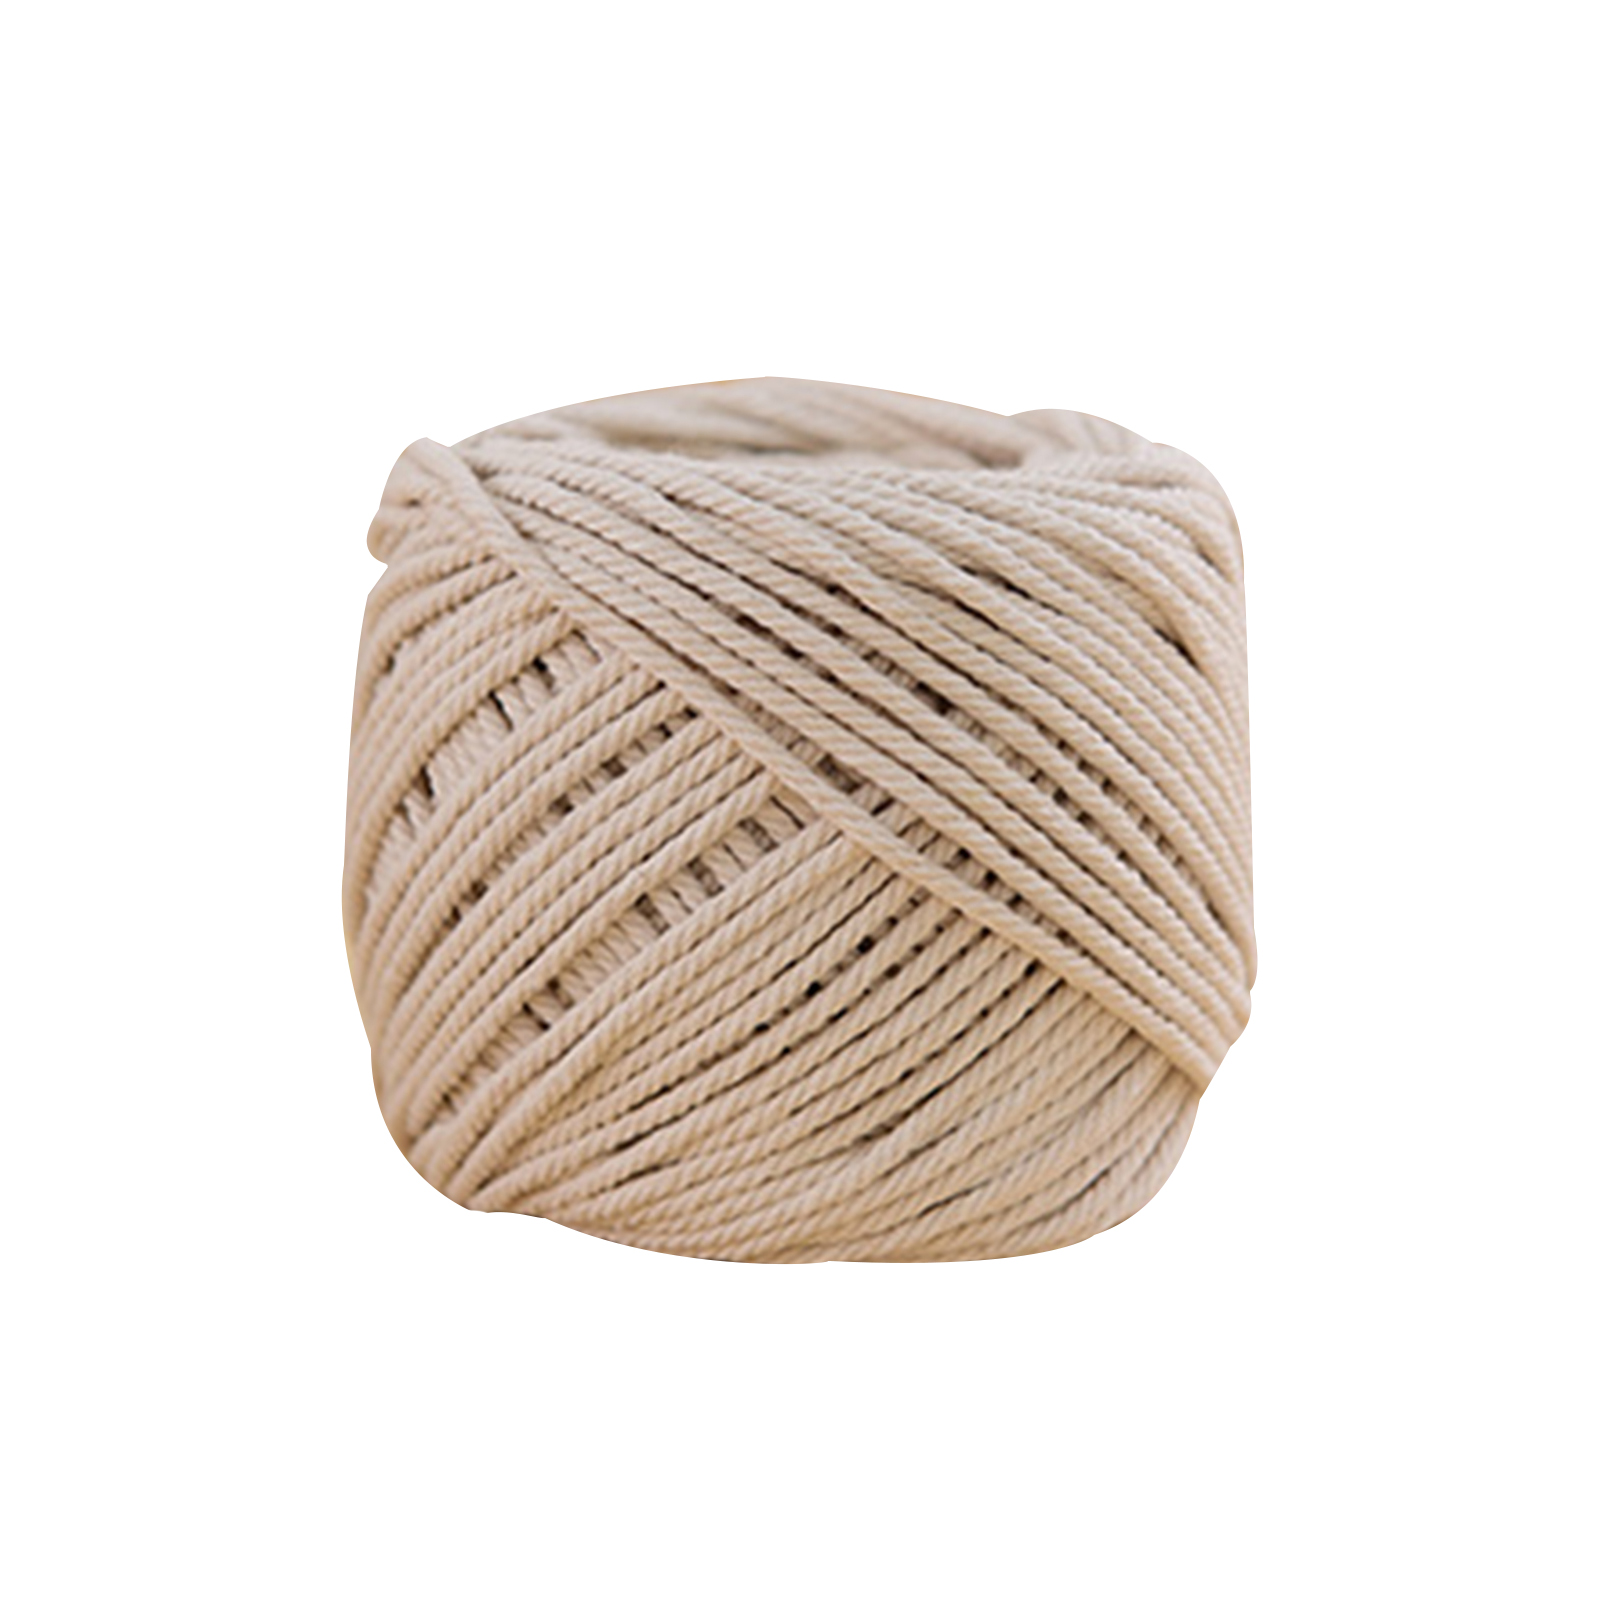 D-tal Briaded Elastic Band White Elastic String Cord Heavy Stretch High Elasticity Knit Elastic Band for Sewing Craft DIY 1//8 inch